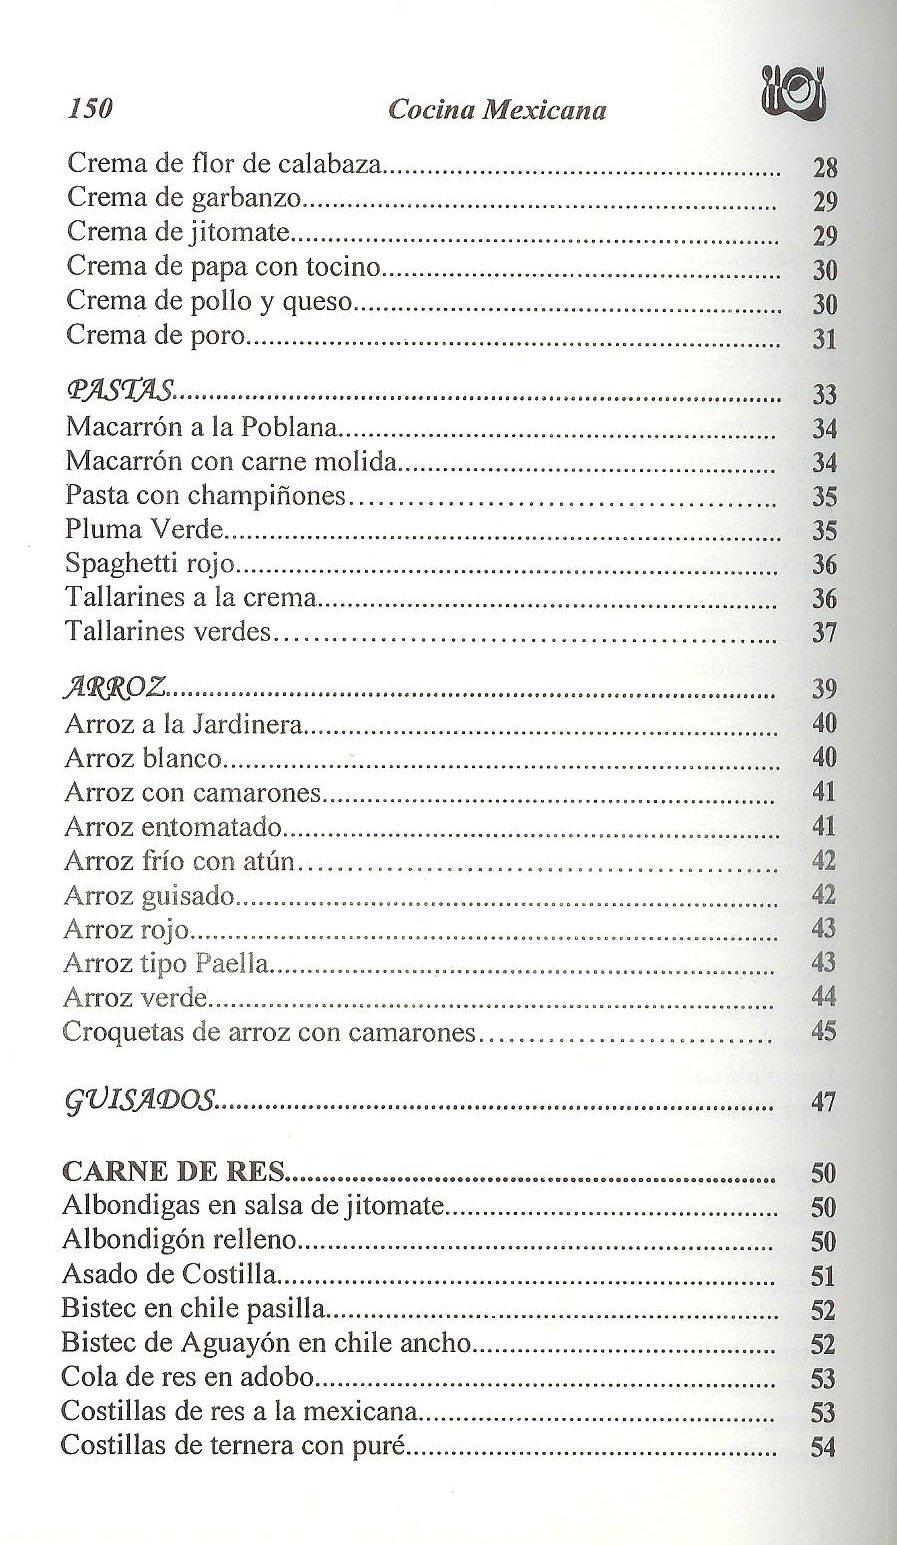 Cocina Mexicana, Mini Enciclopedia (Spanish Edition): Irma Bolanios, Berbera Editores: 9789707830226: Amazon.com: Books